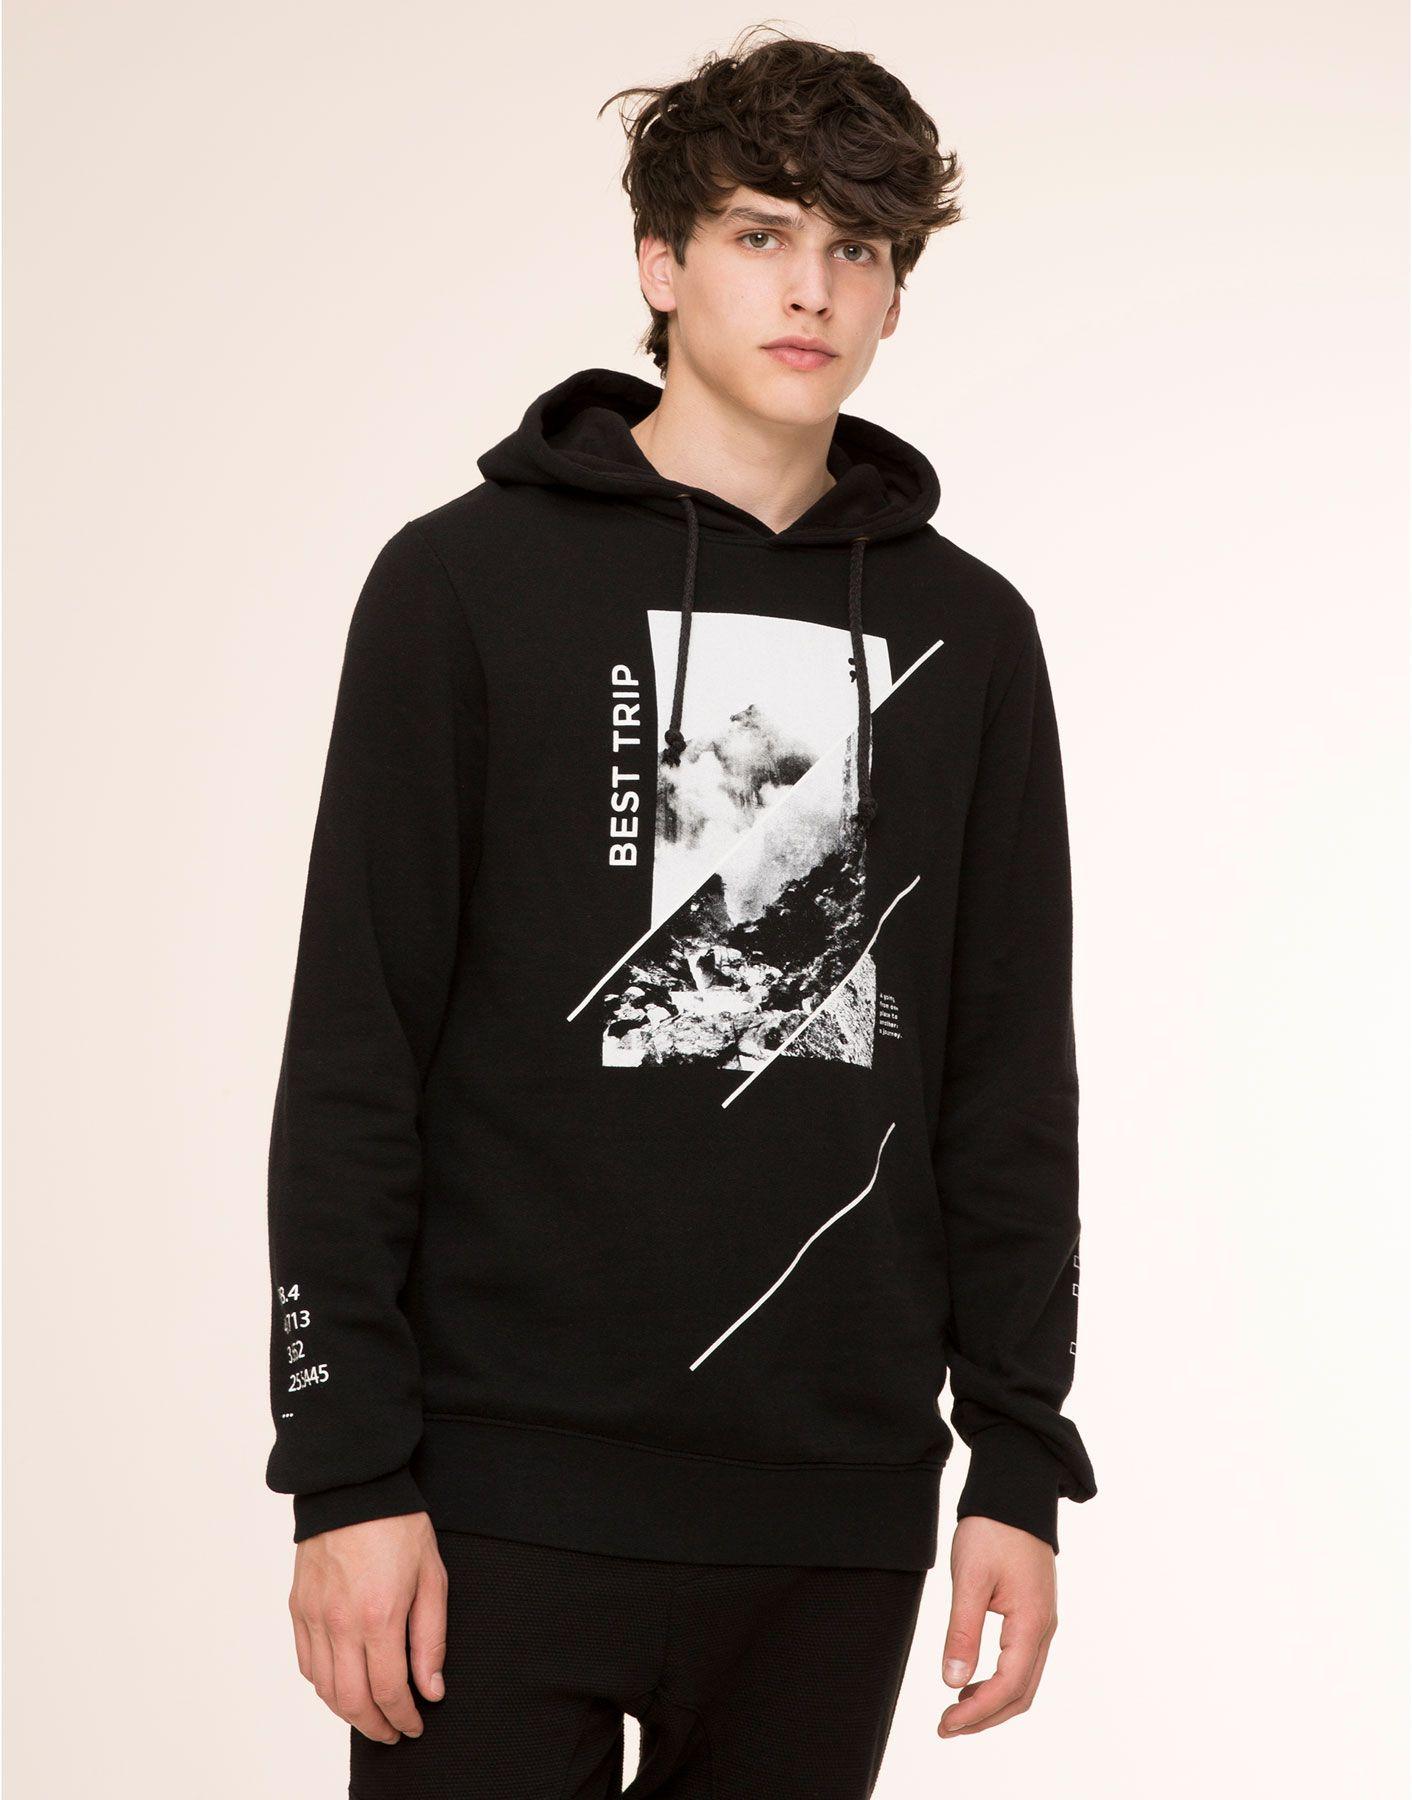 Printed hooded sweatshirt sweatshirts man pullubear indonesia